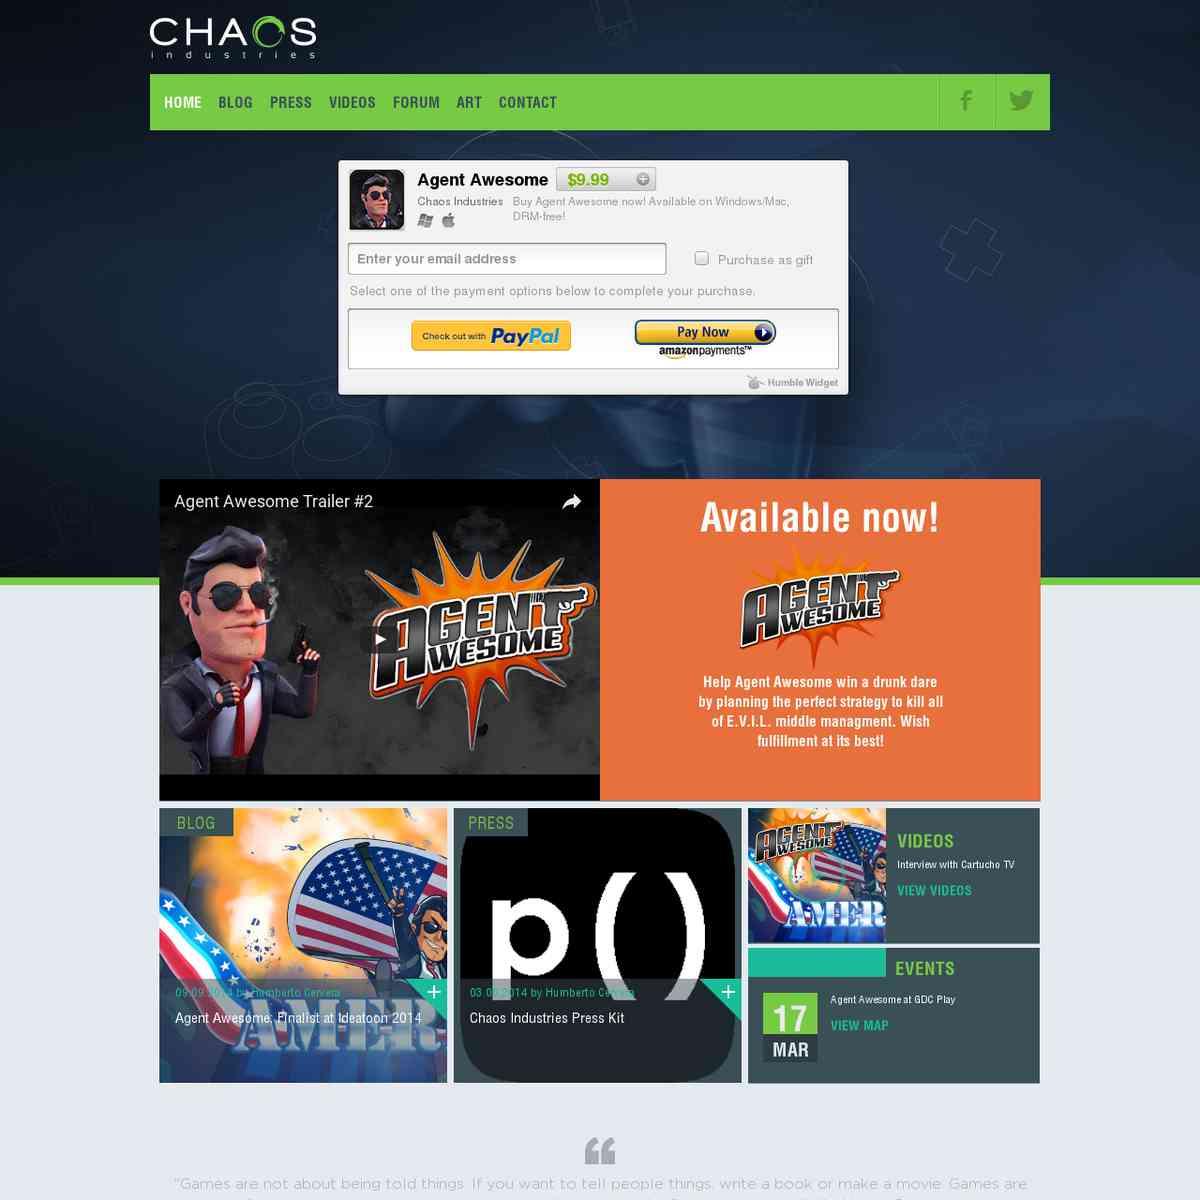 chaosindustries.com.mx